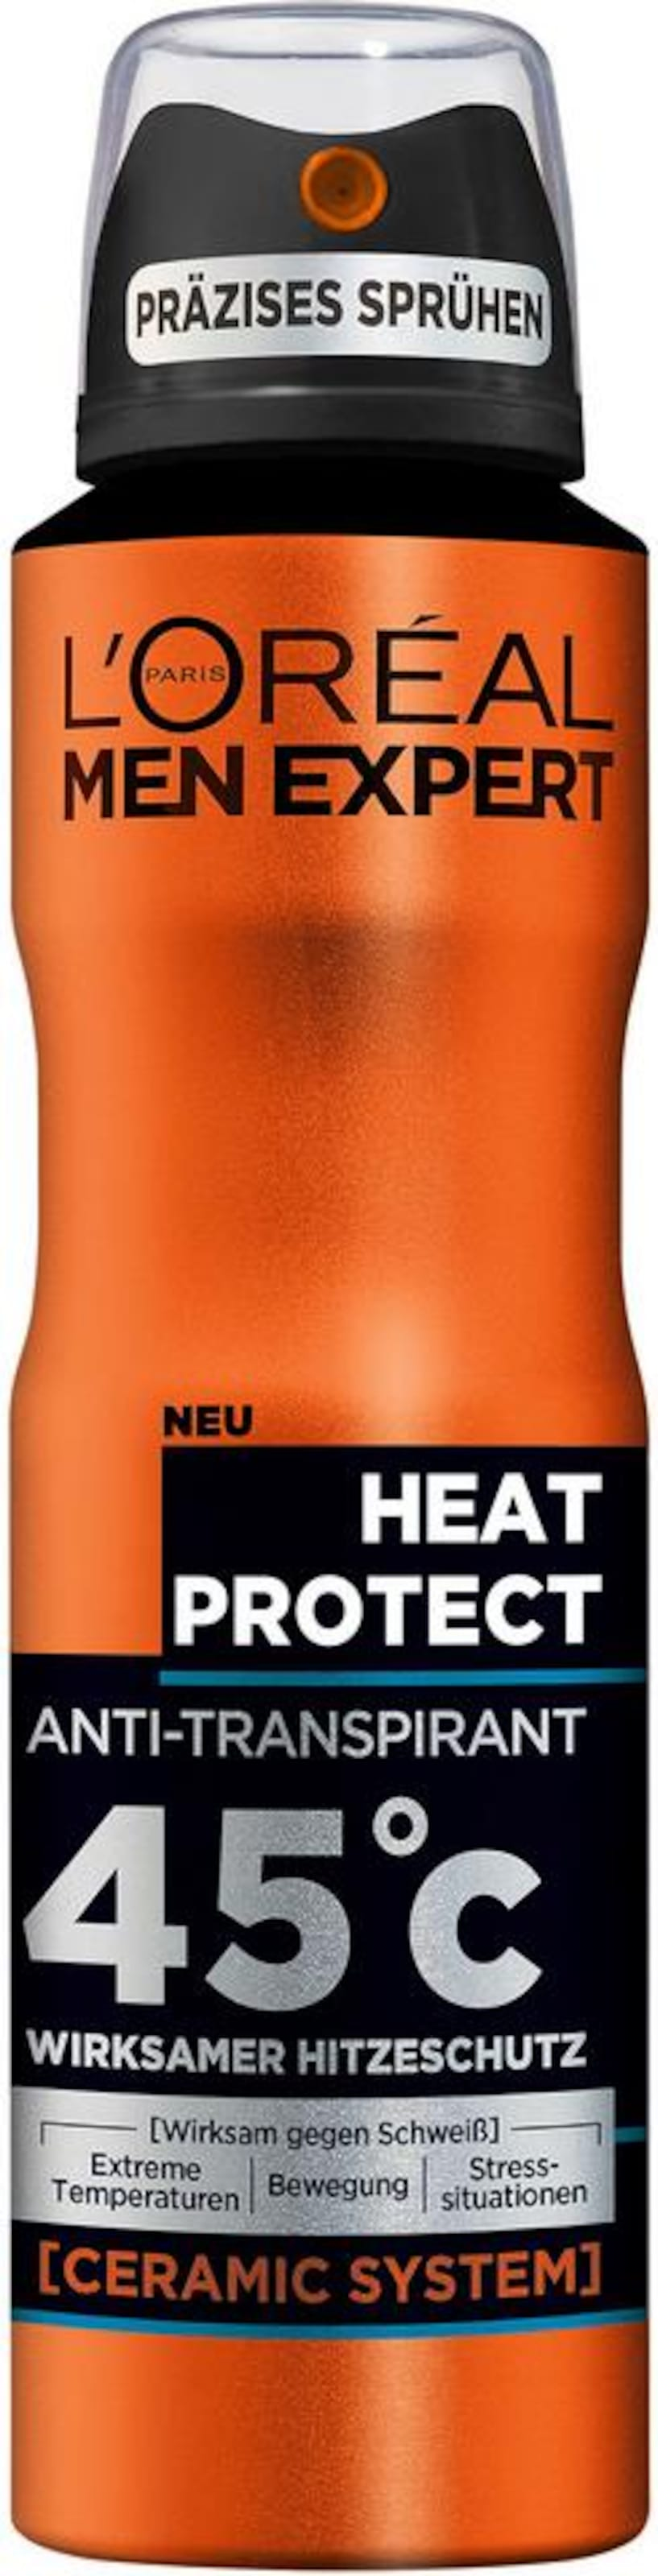 OrangeSchwarz 'heat In Paris Expert spray L'oréal Men Protect'Deo lKTJF1c